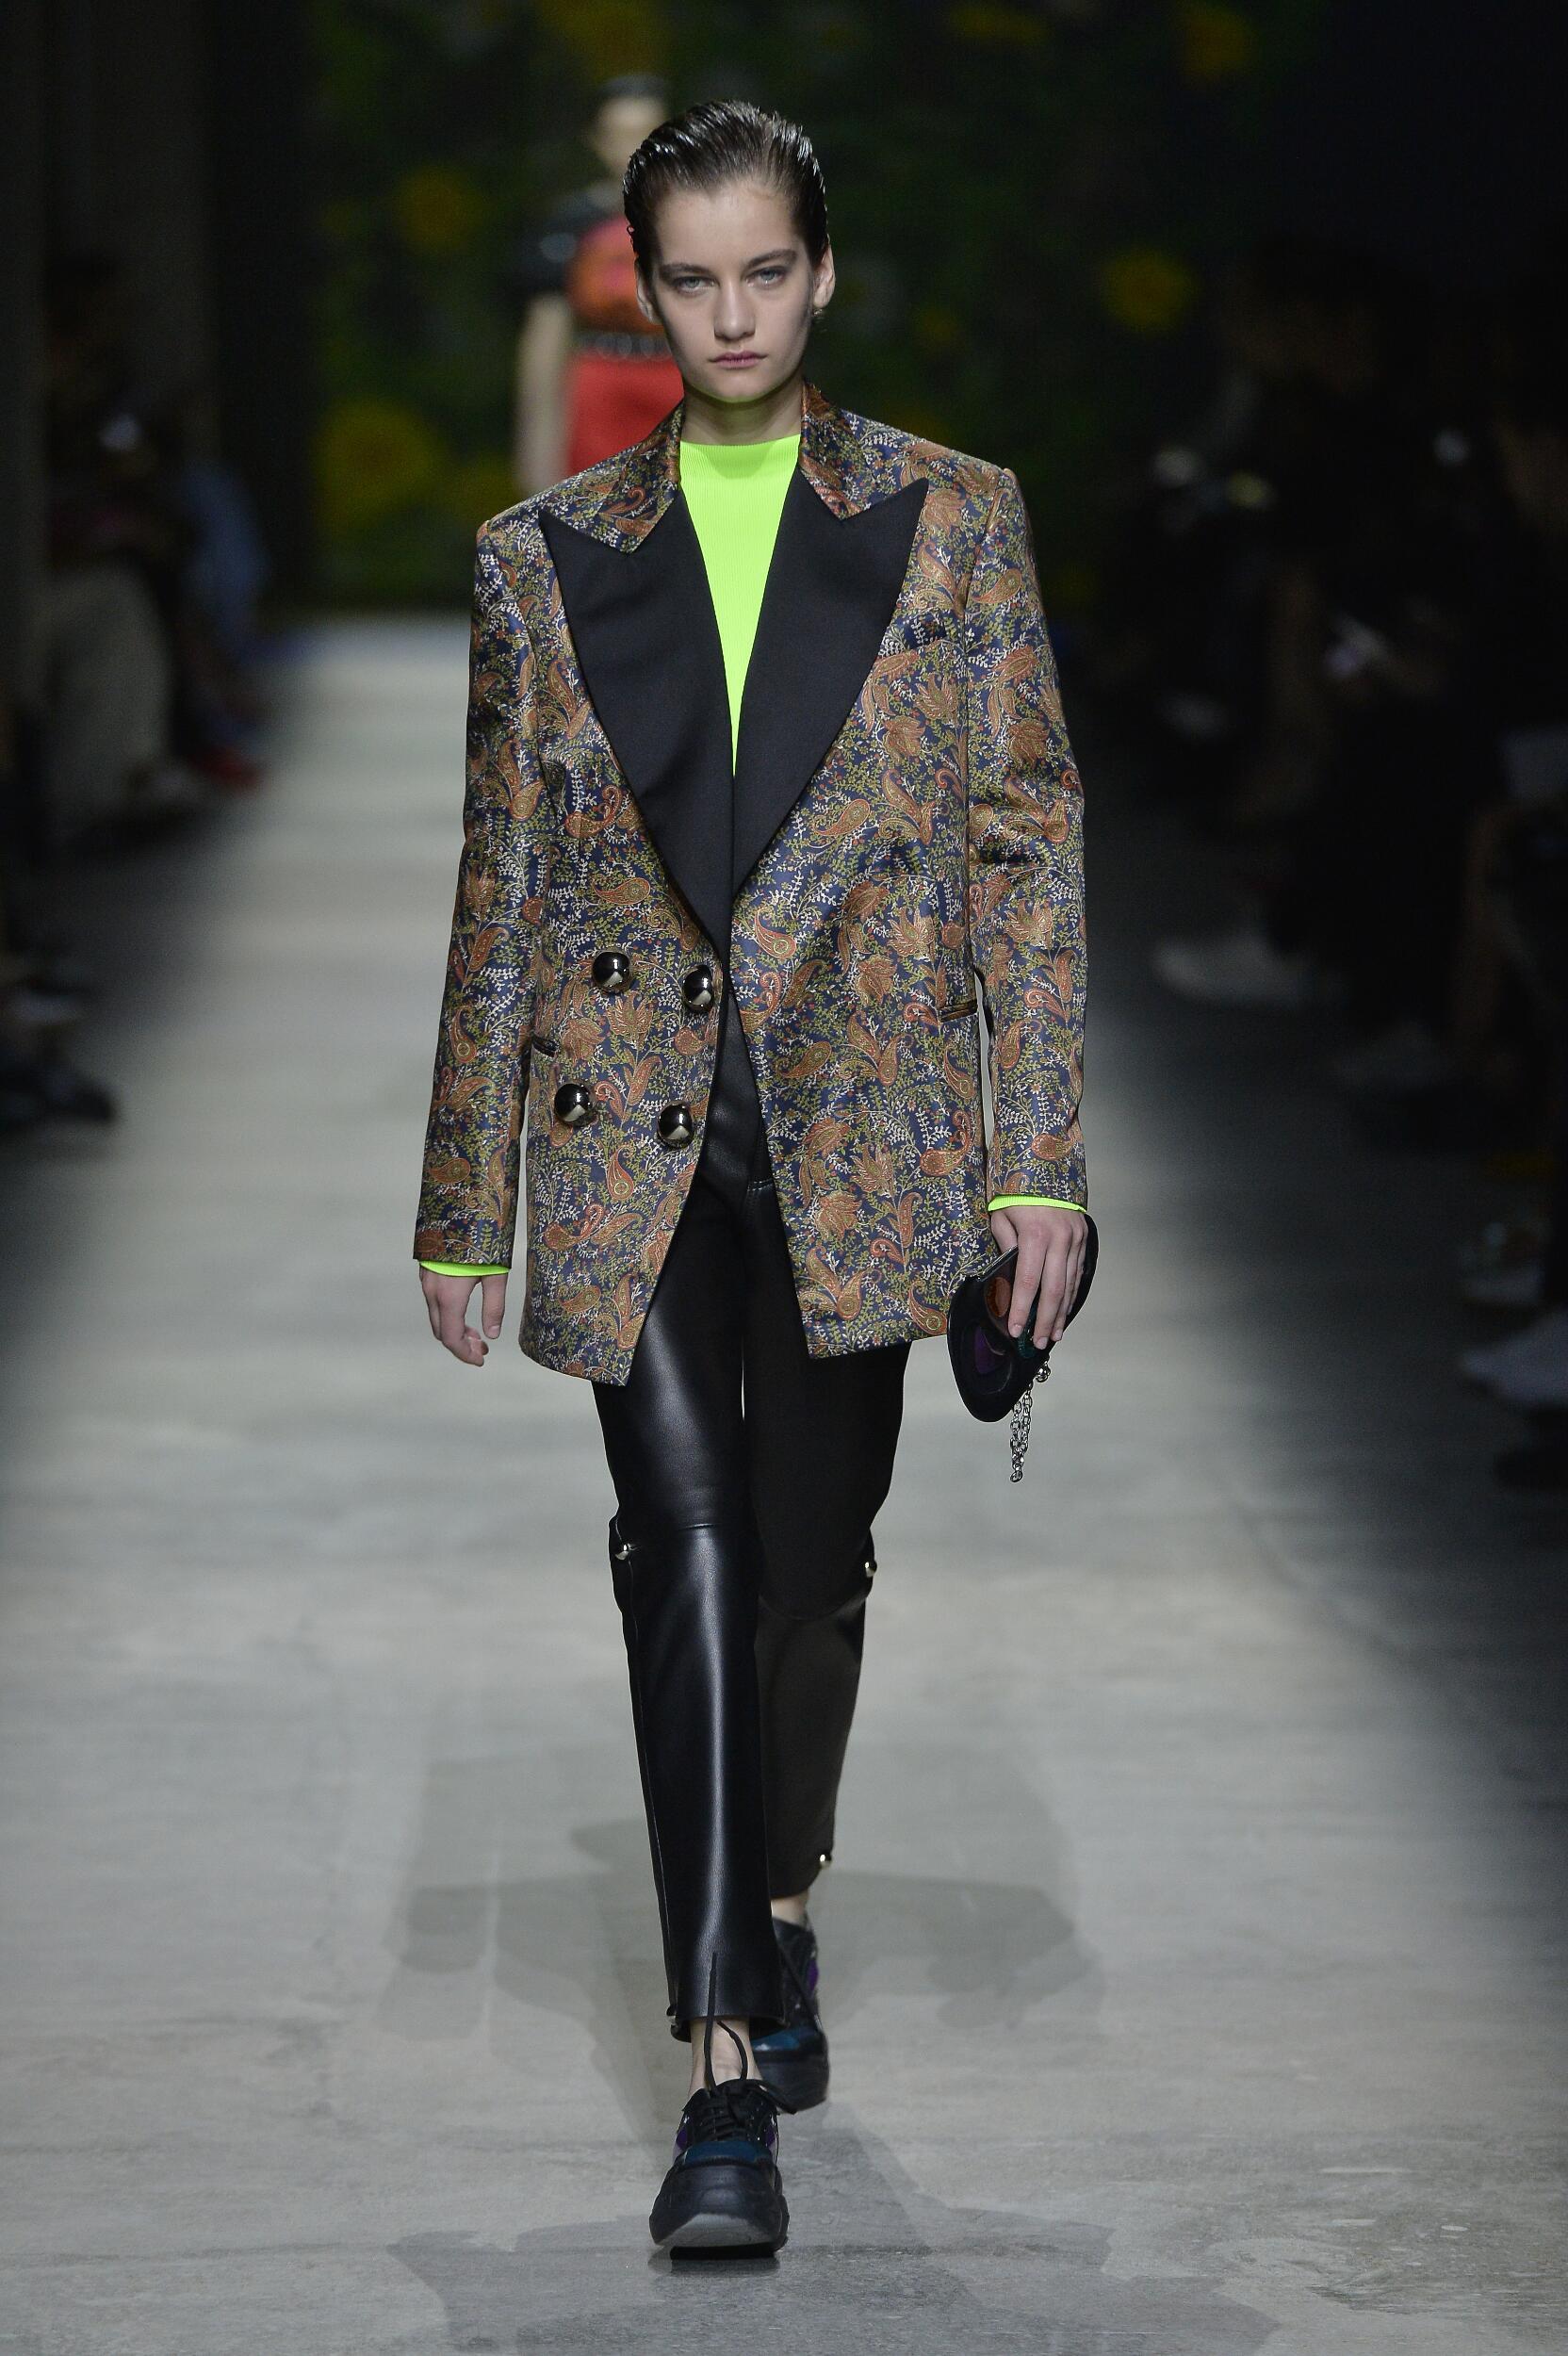 Runway Christopher Kane Spring Summer 2020 Women's Collection London Fashion Week